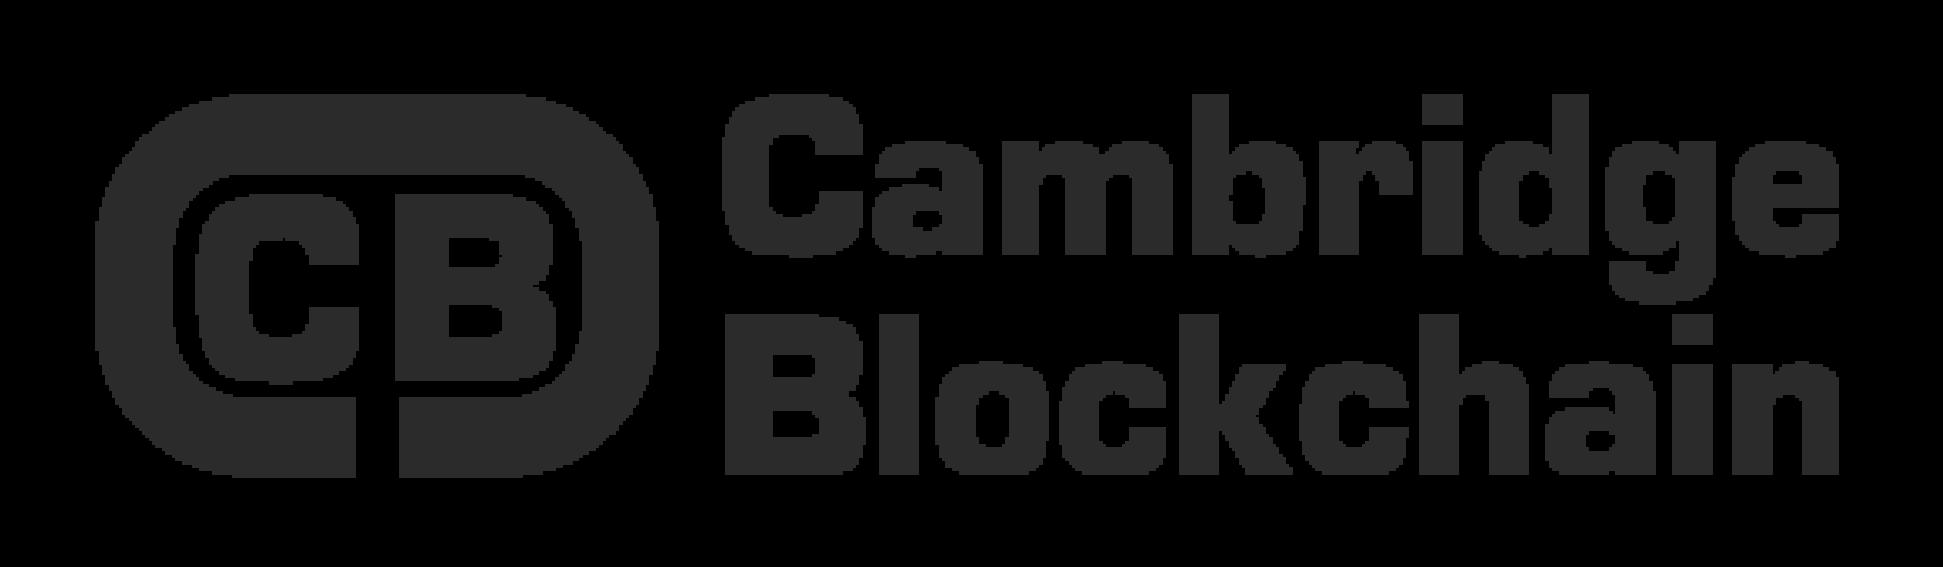 logo cambridge blockchain